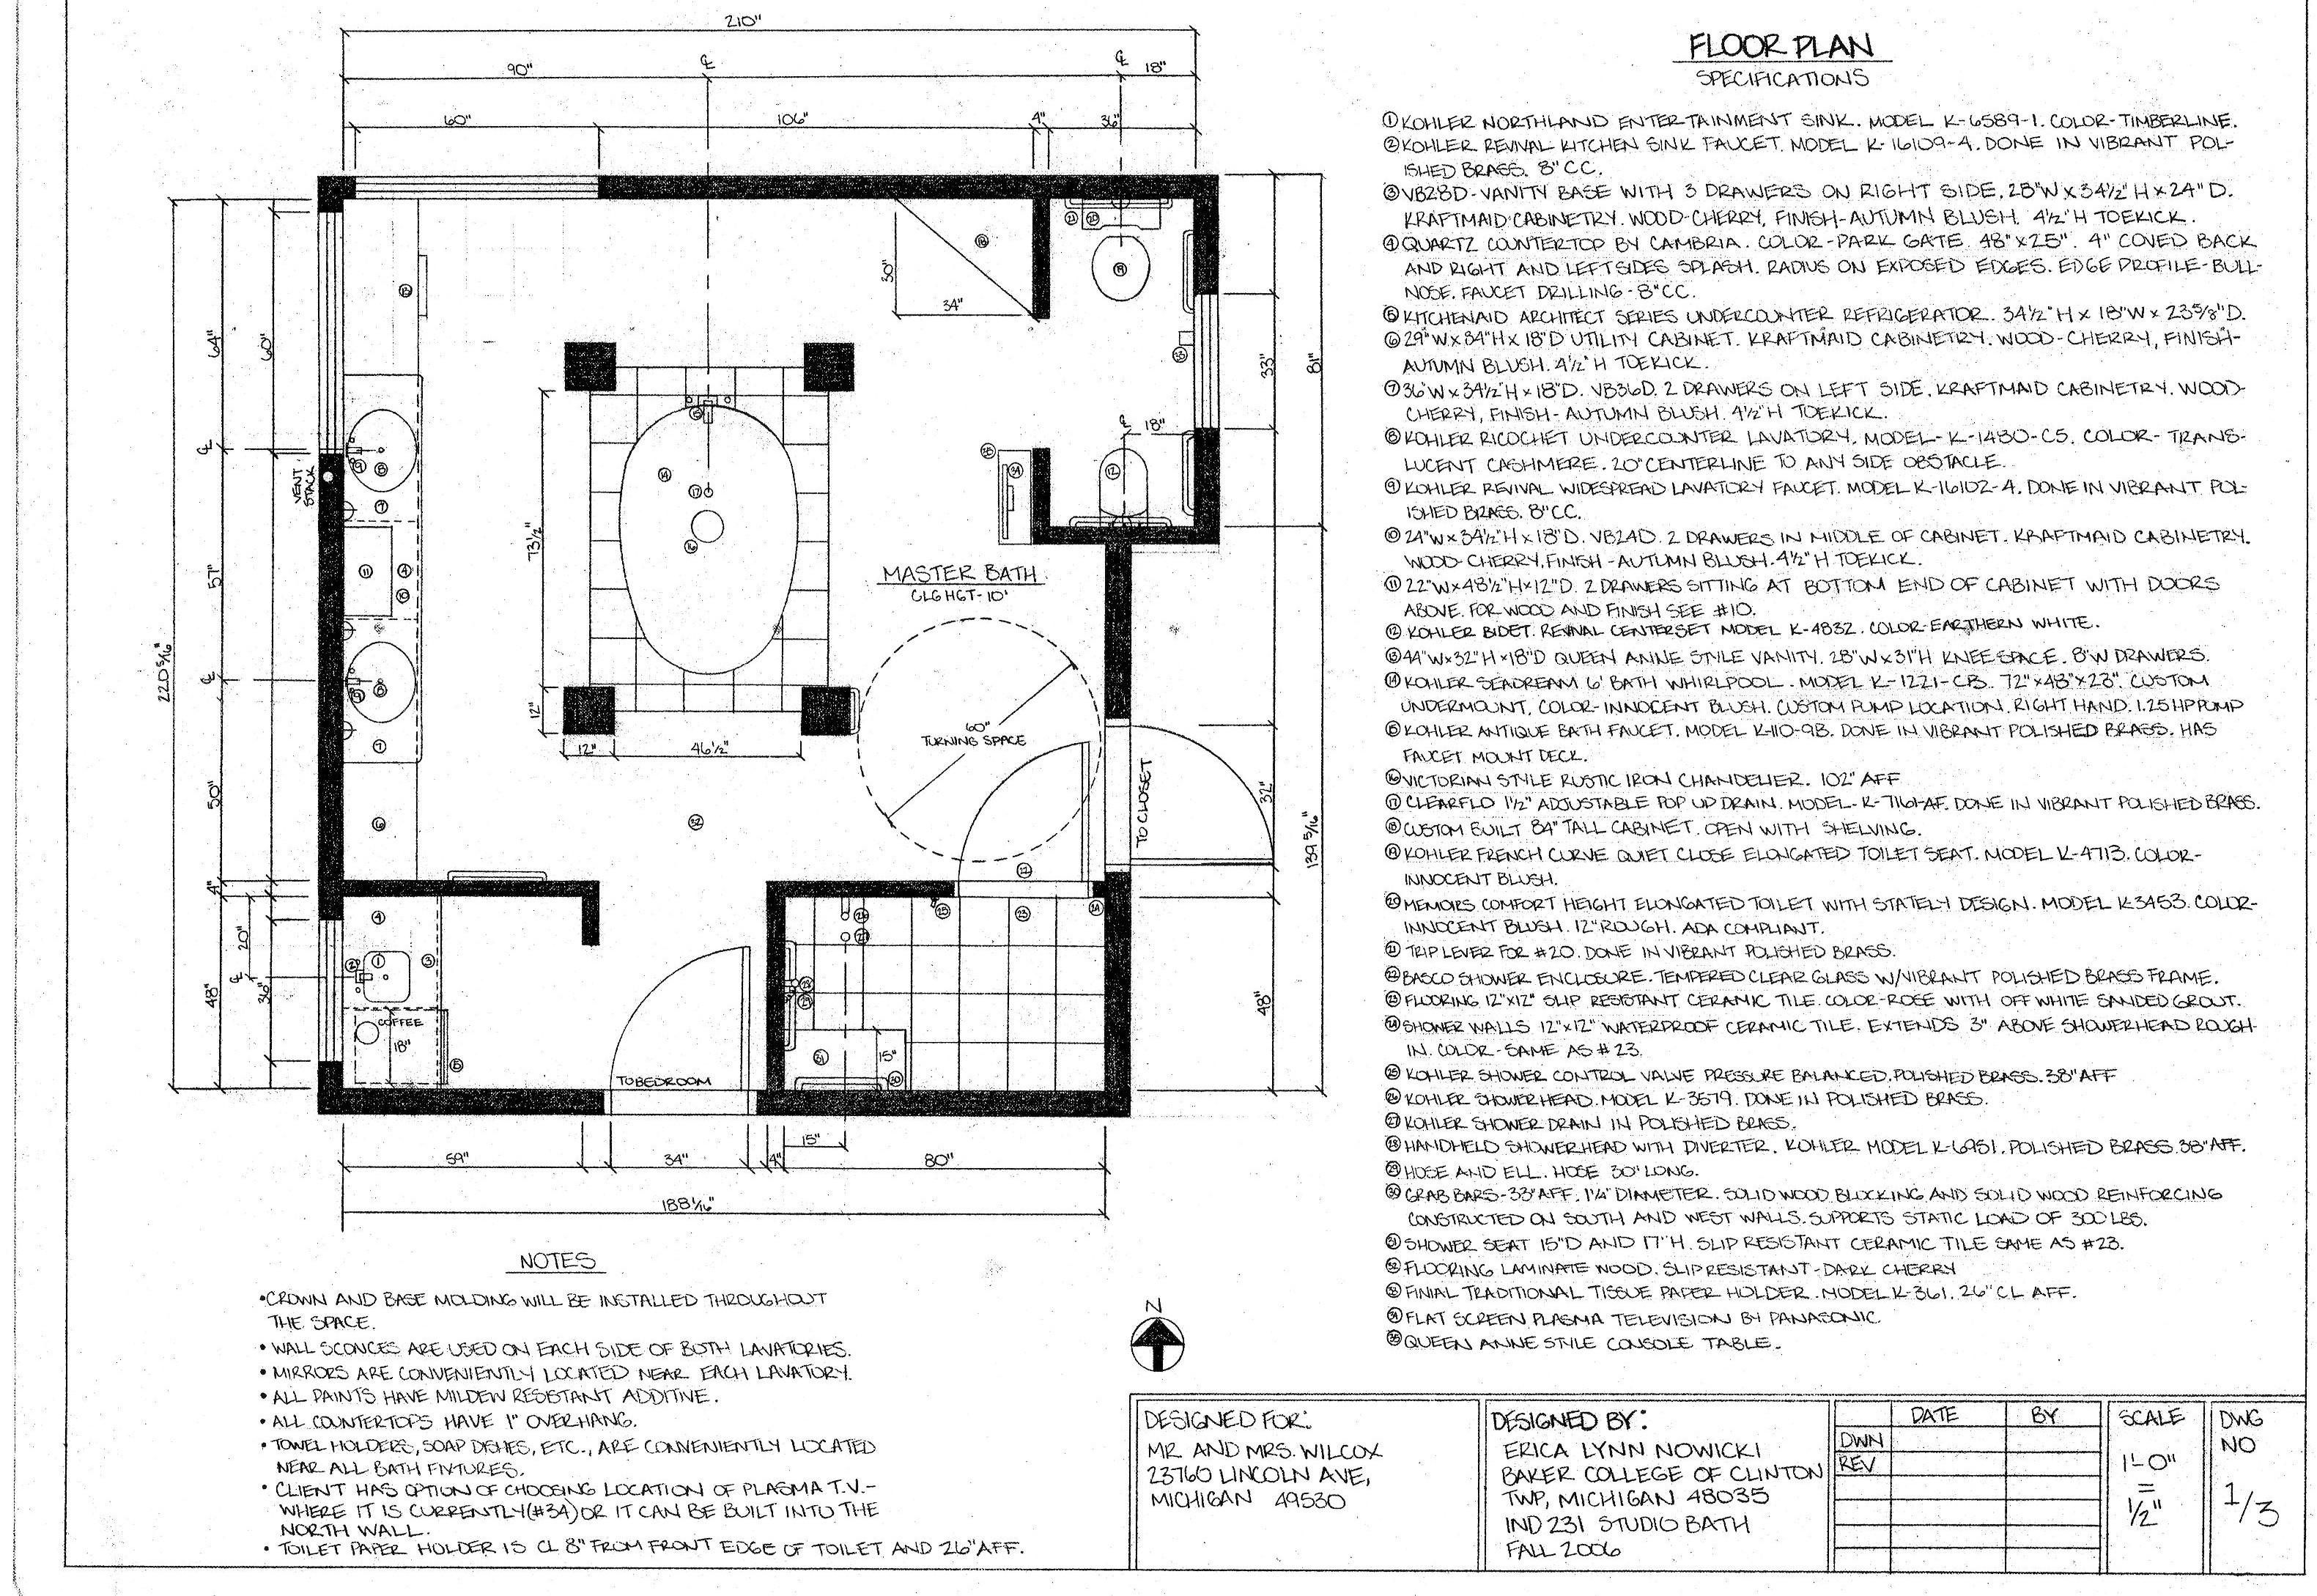 Bathroom Design By Erica Nowicki Snyder Leed Green